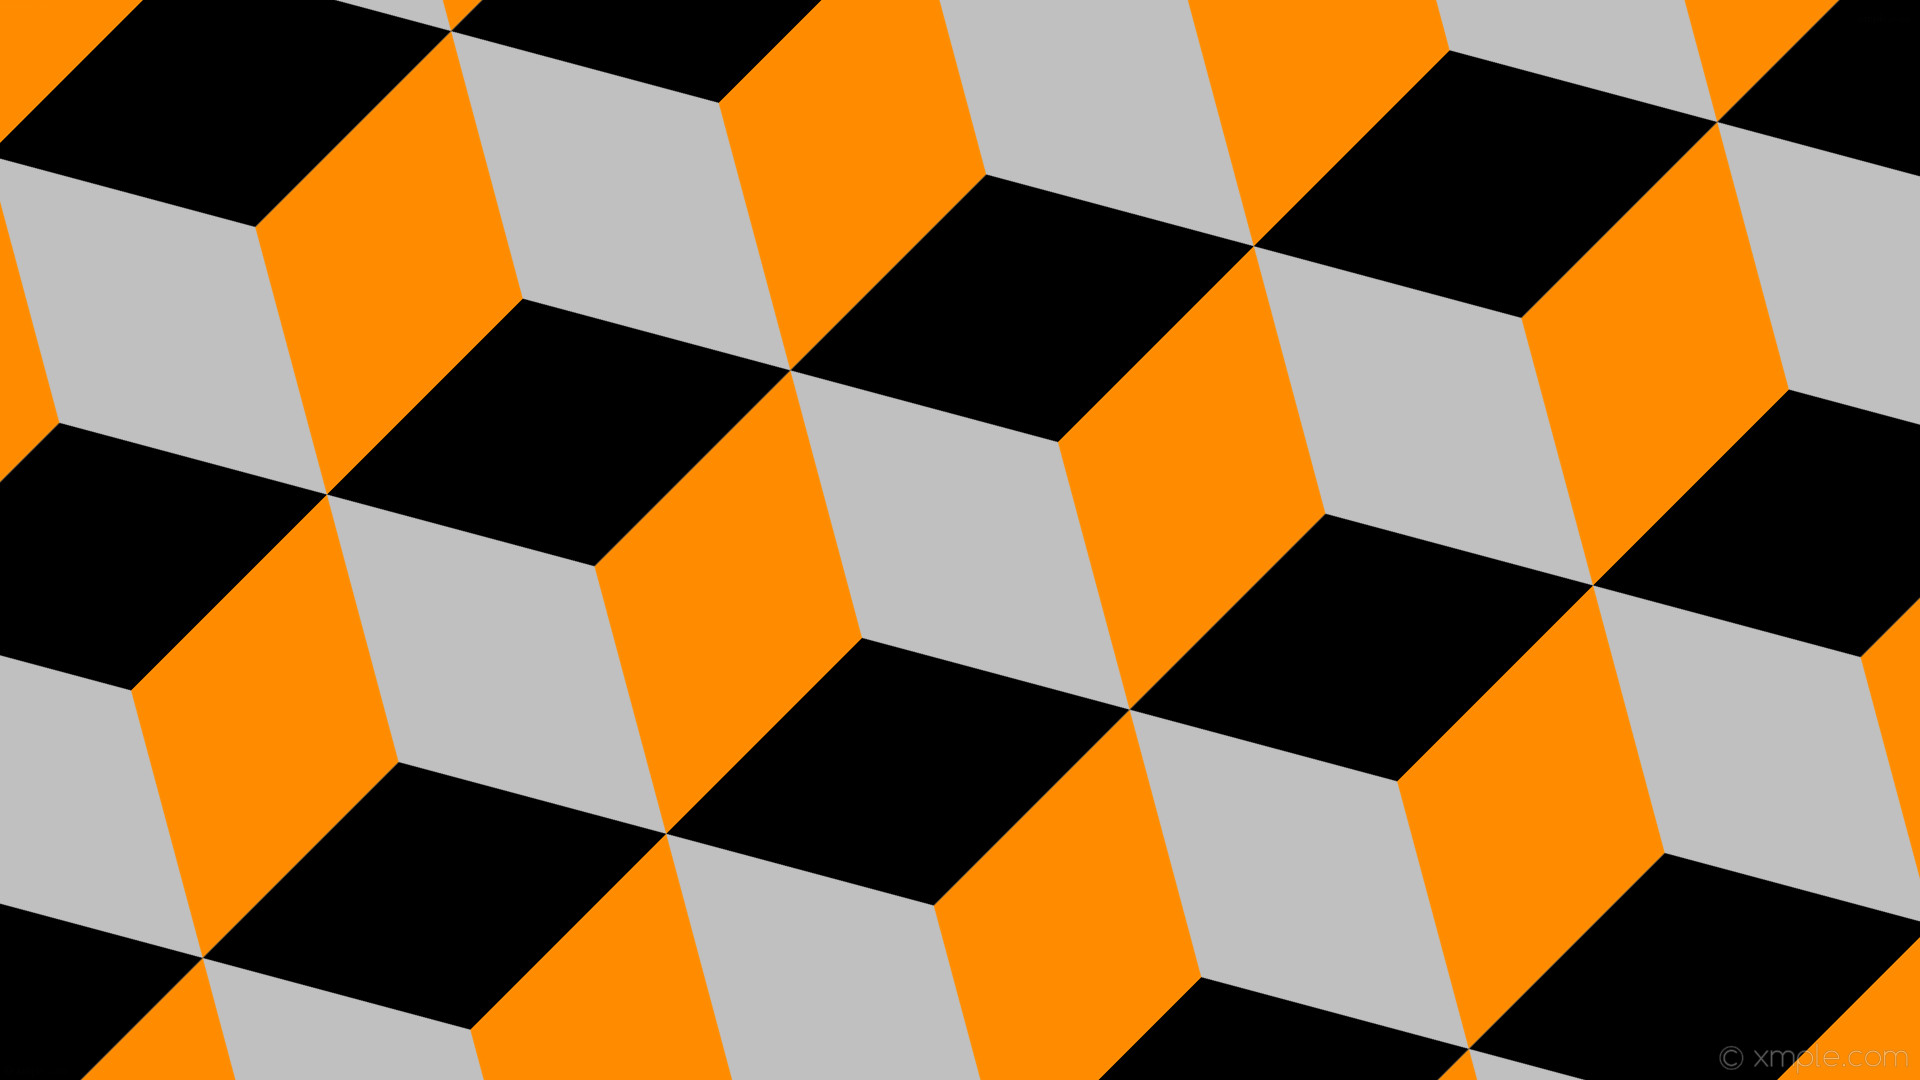 wallpaper grey 3d cubes black orange silver dark orange #c0c0c0 #ff8c00  #000000 135